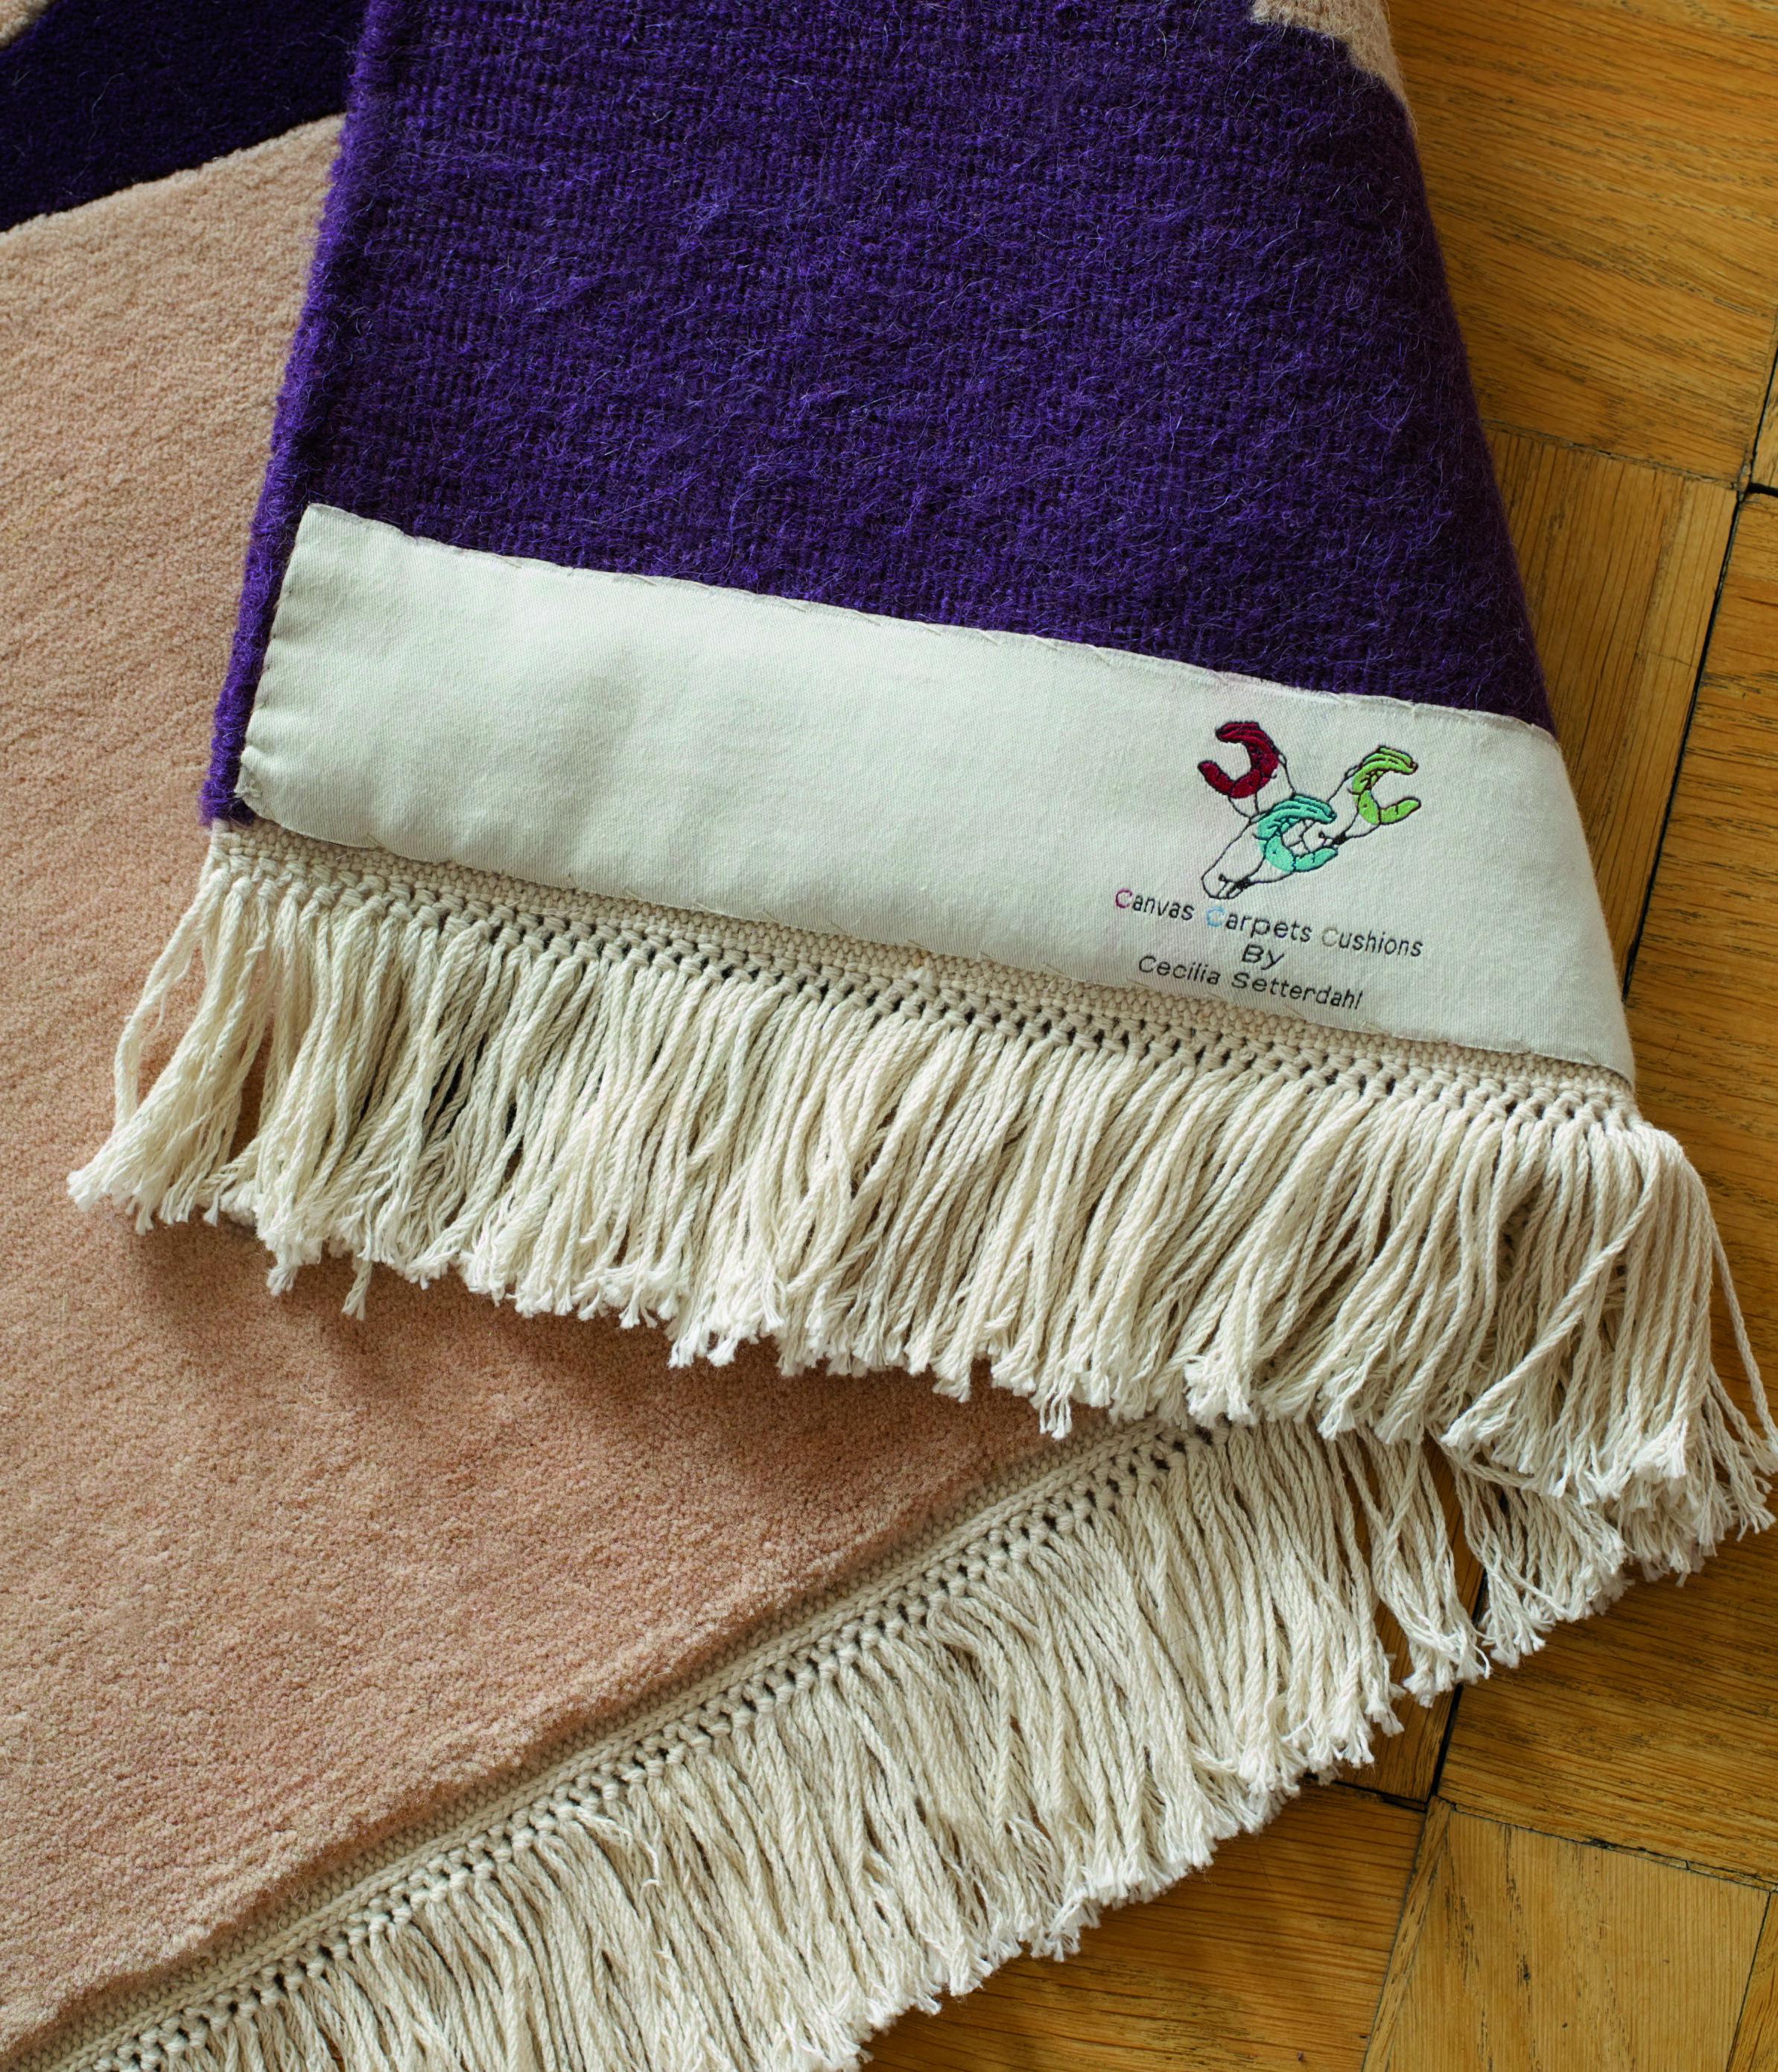 Cecilia-Setterdahl-CarpetsCC-Canvas-Carpets-Cushions-Carpet-Logo-2016.jpg